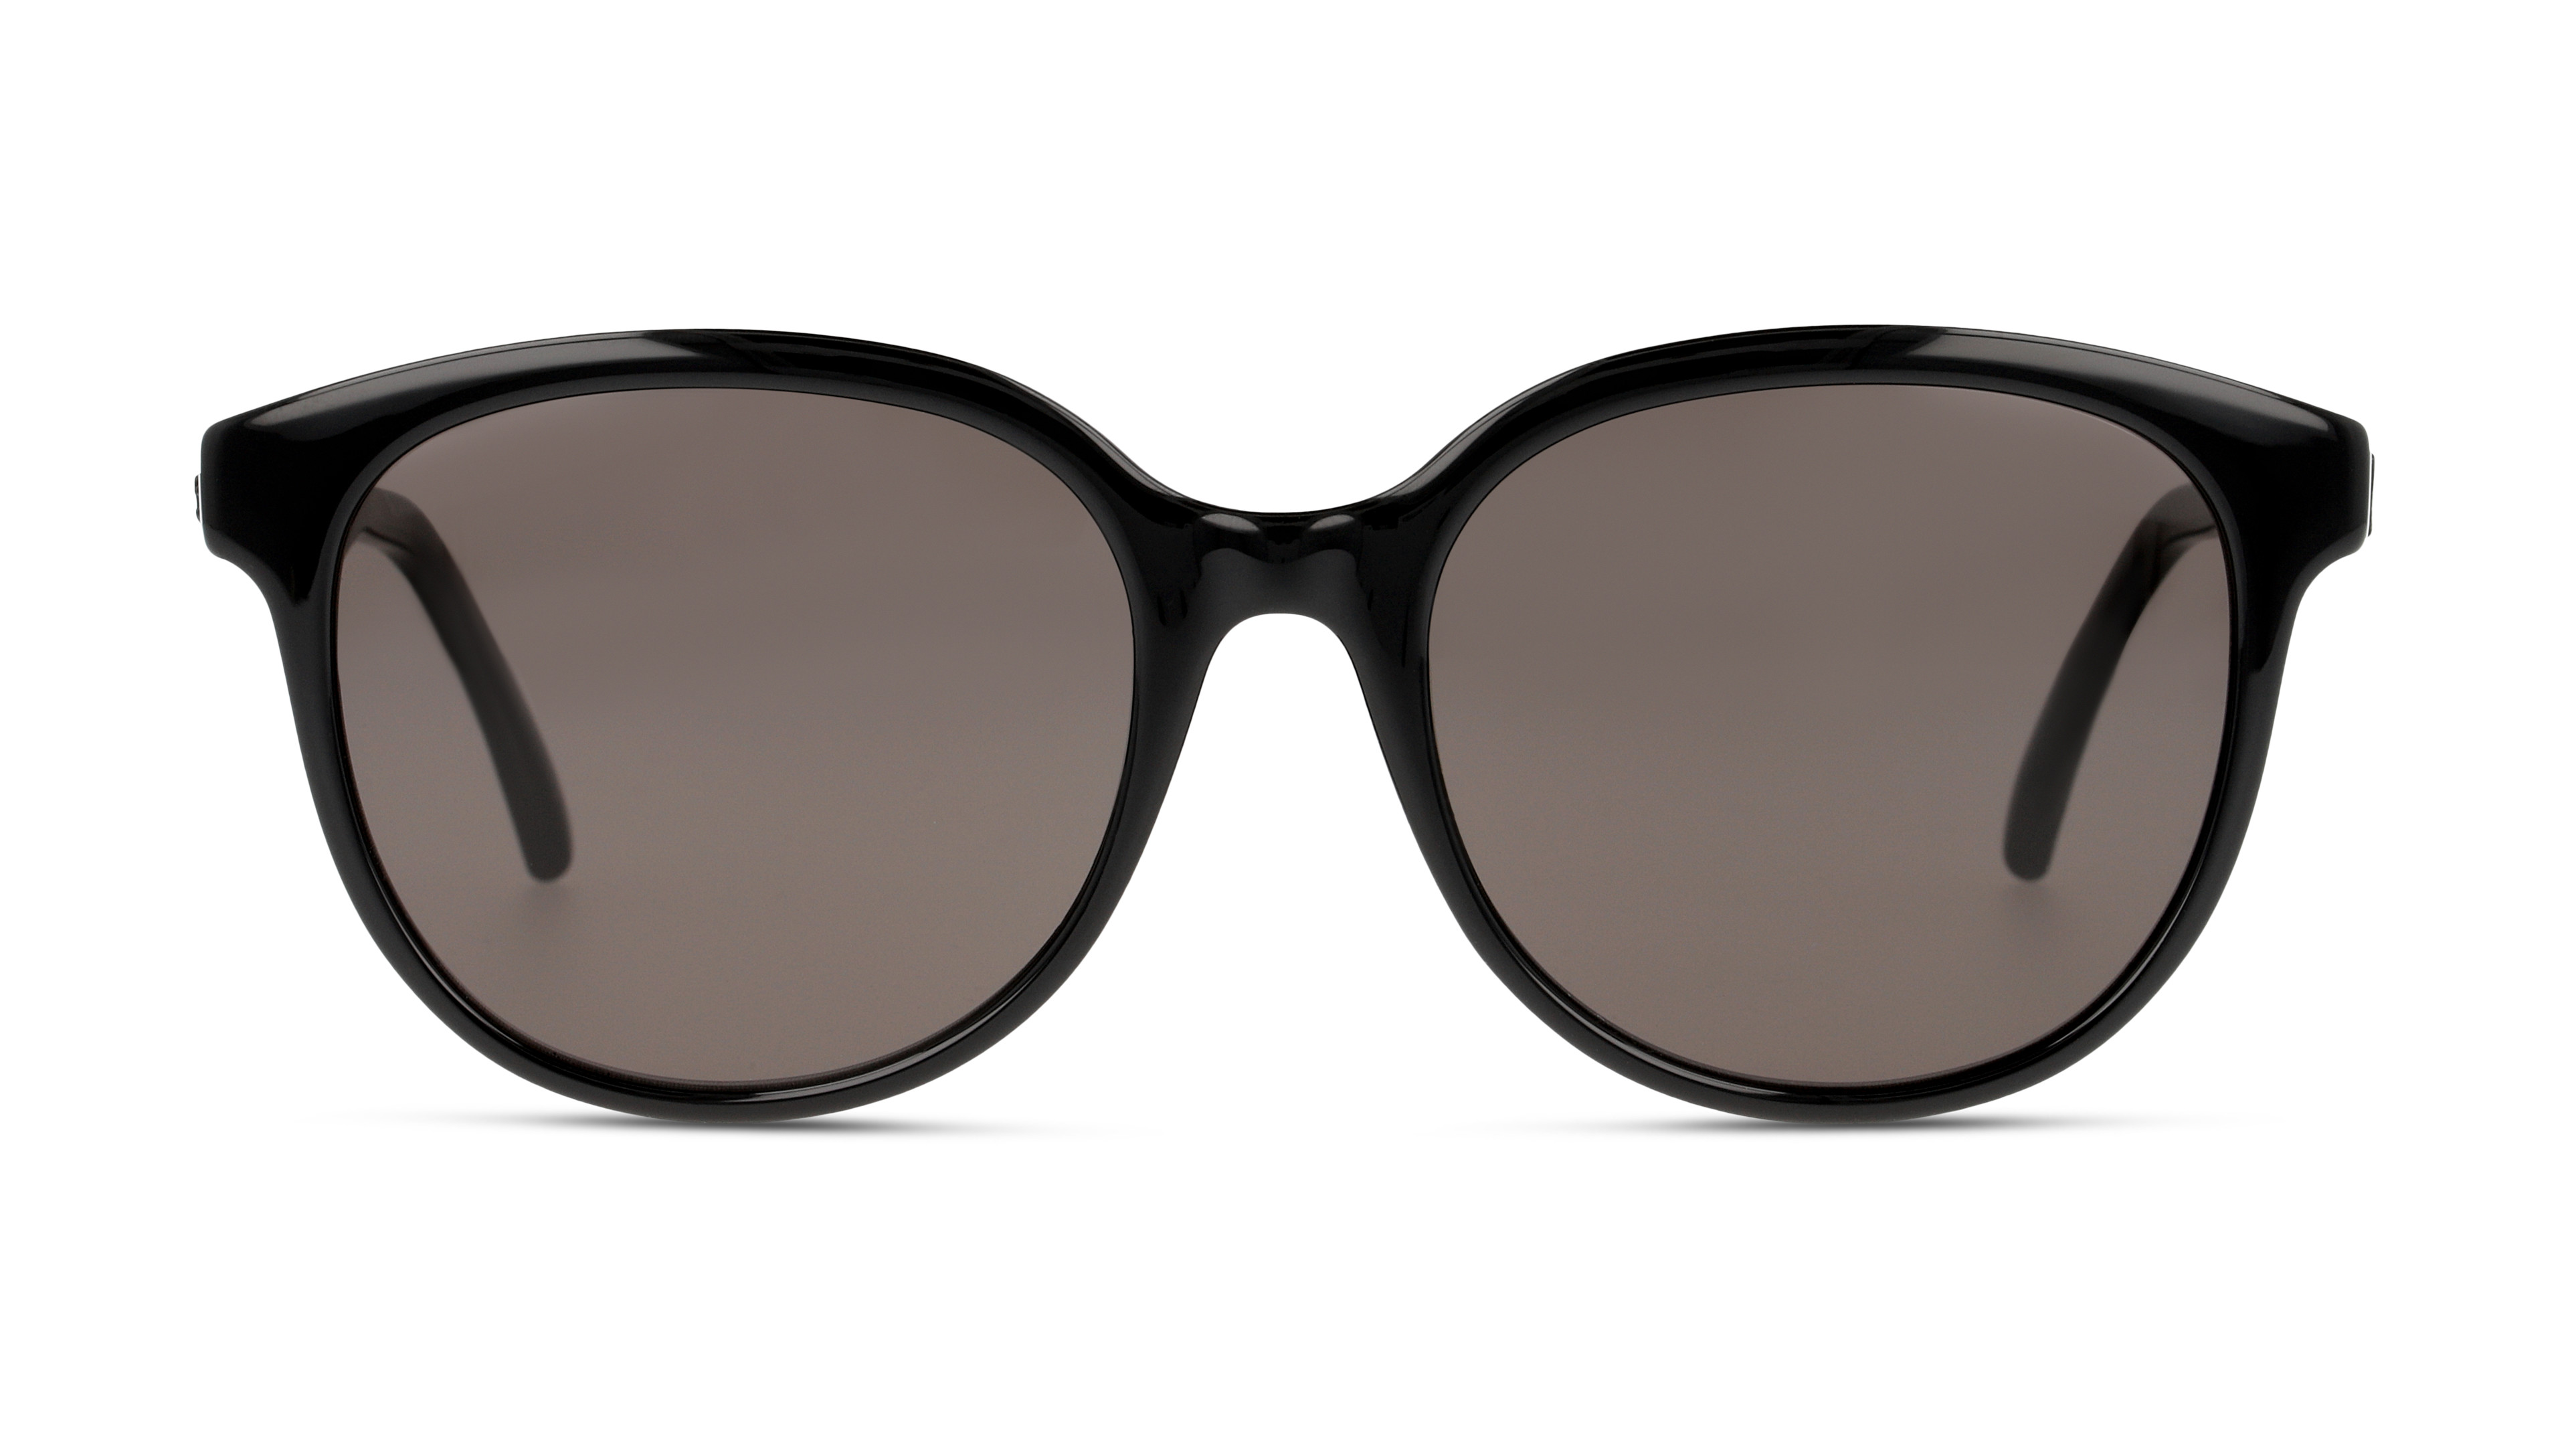 8056376290738-front-01-saint-laurent-sl_317-eyewear-black-black-black